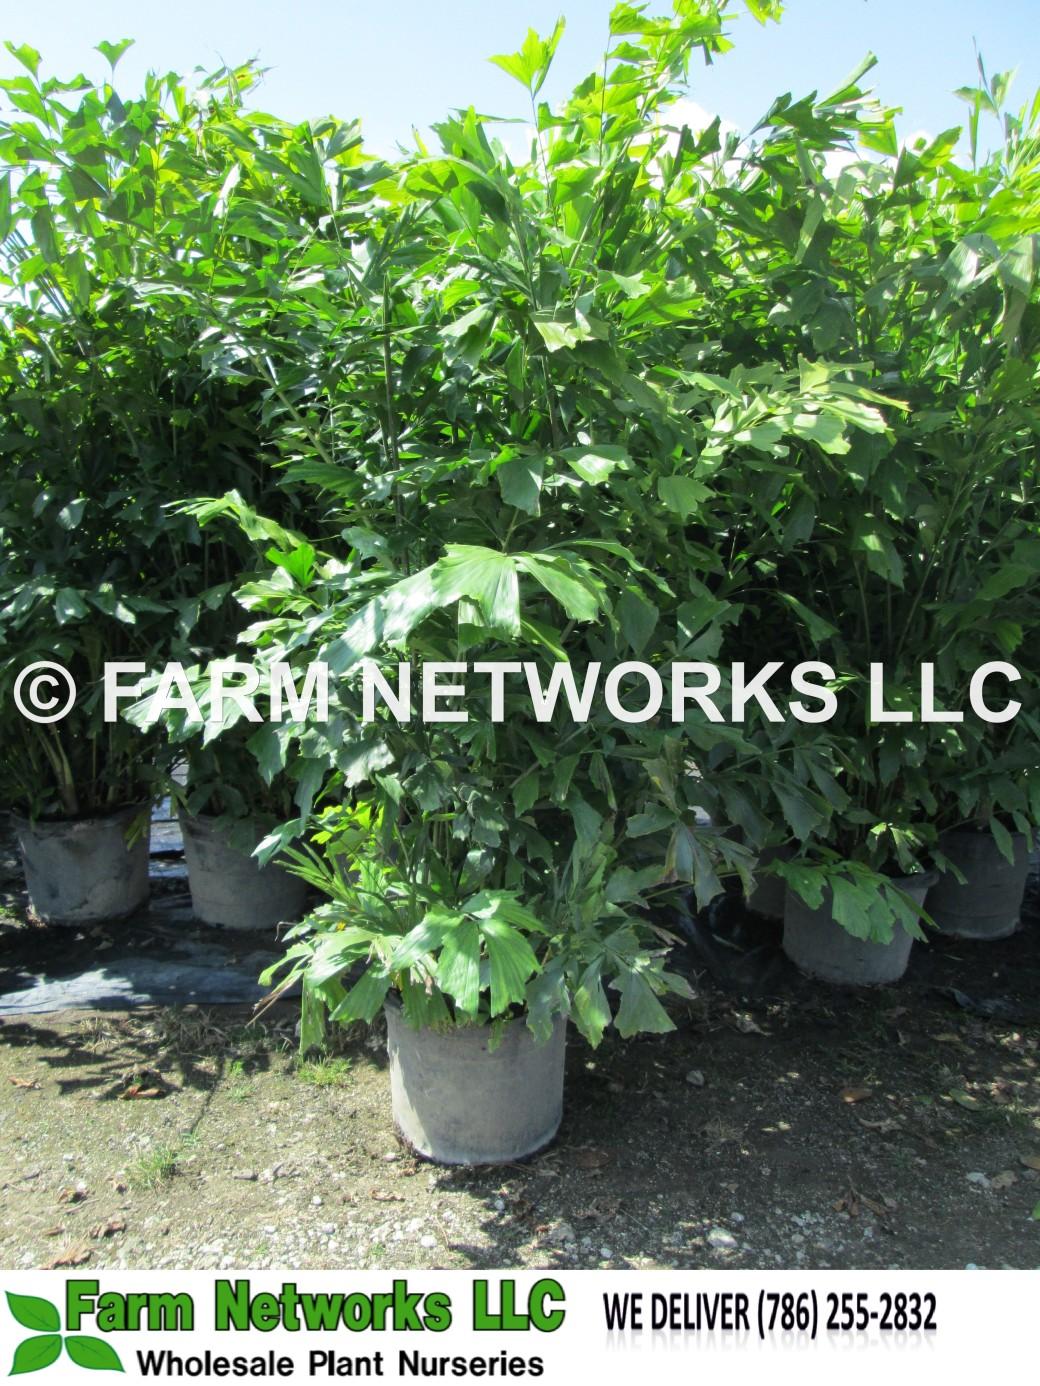 7 Gallon-Fishtail Palm Trees for Sale